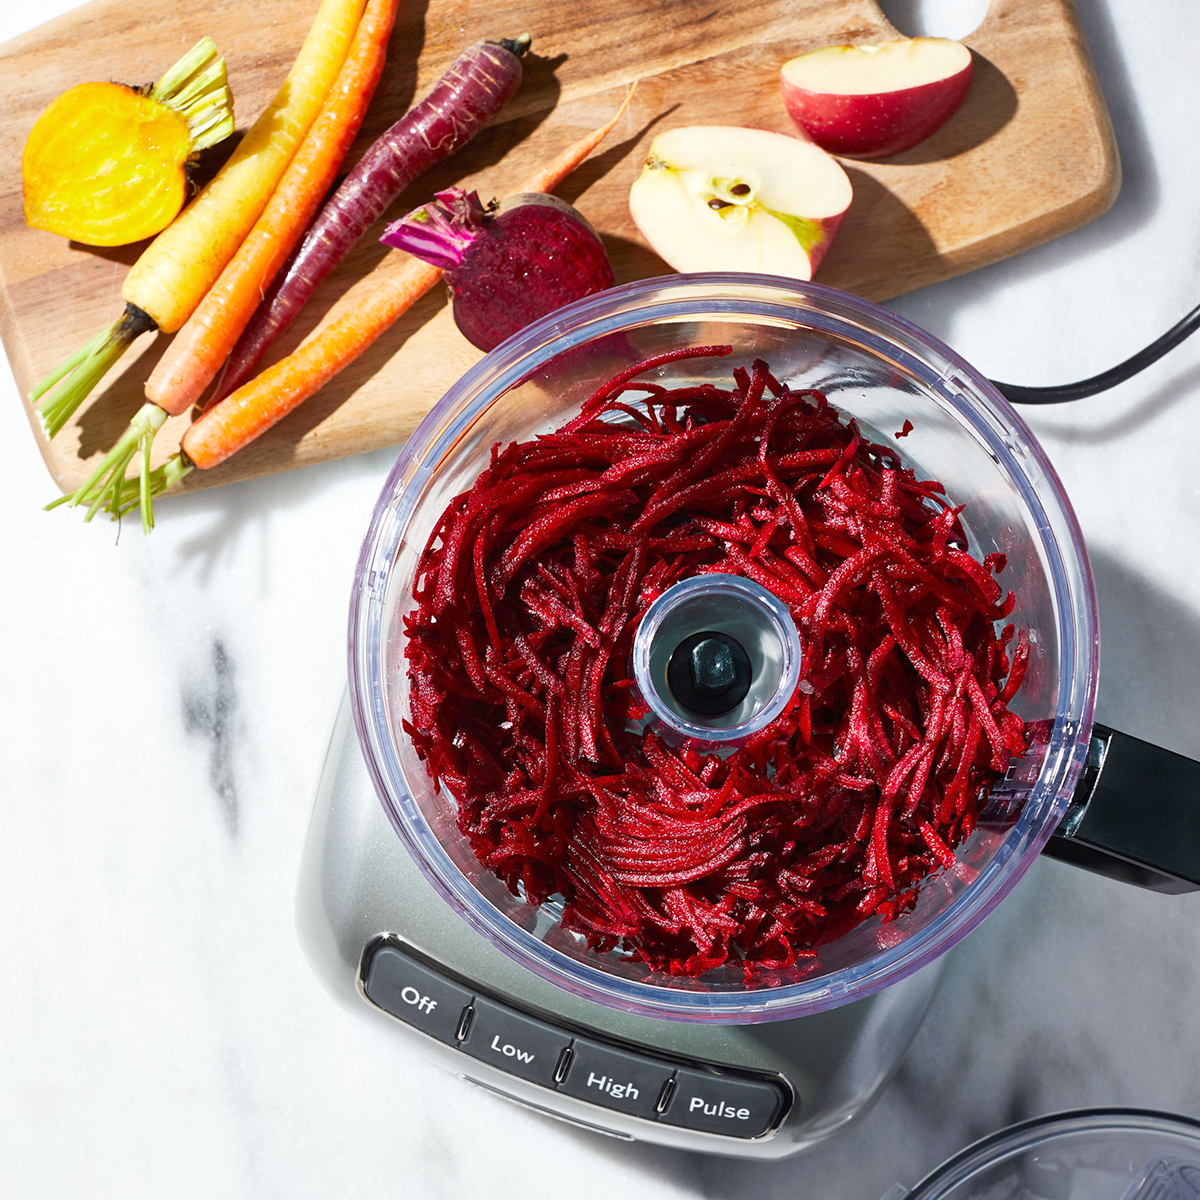 beets in food processor near cutting board